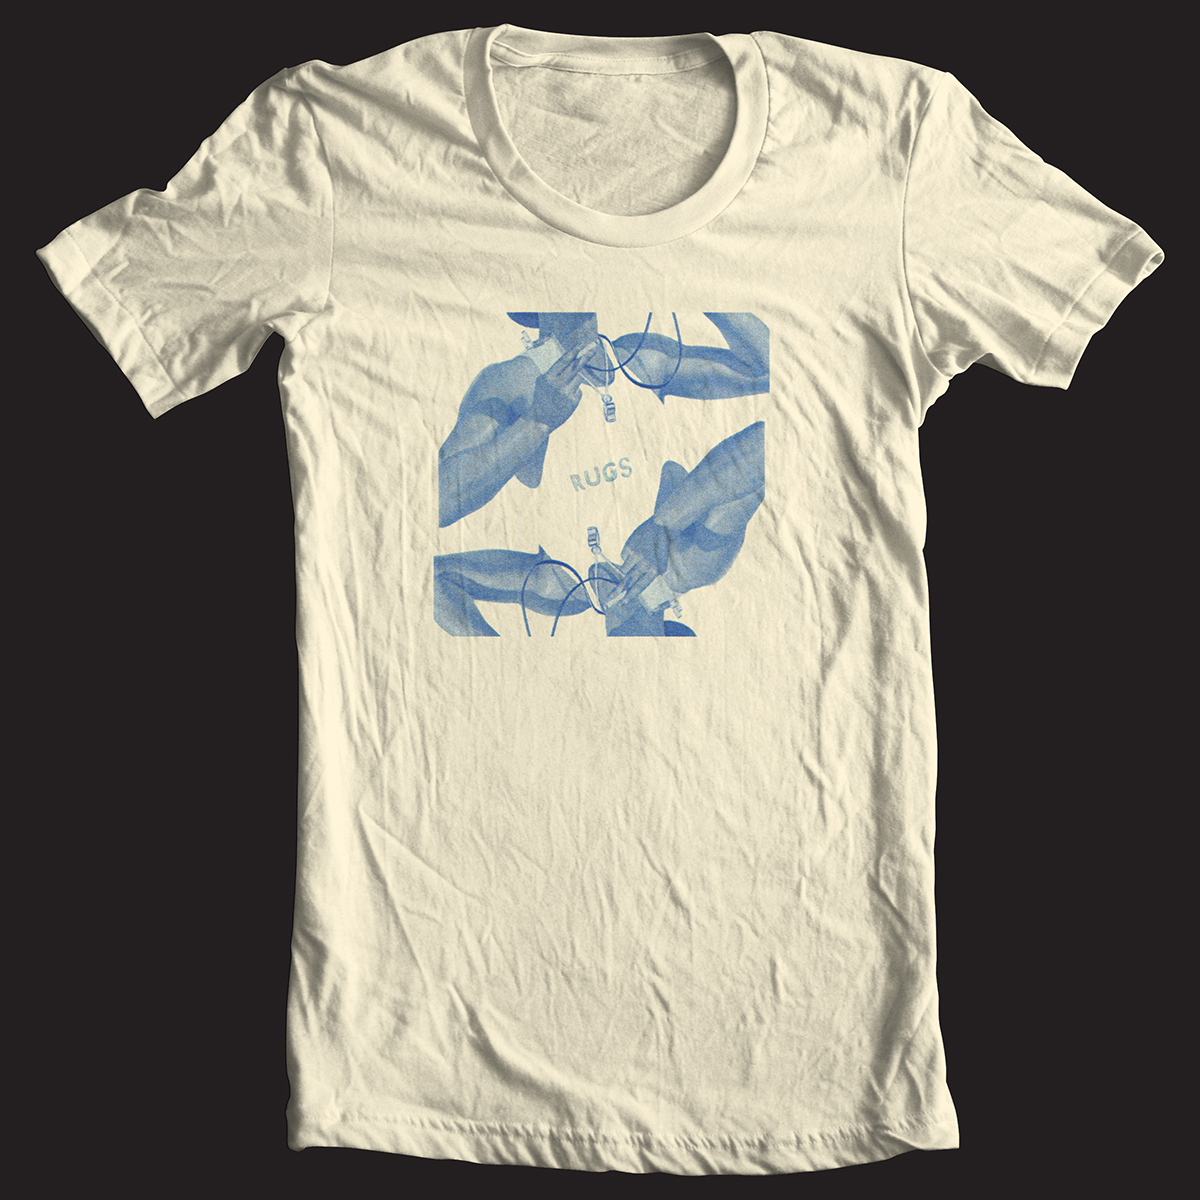 shirt_rugs2.jpg